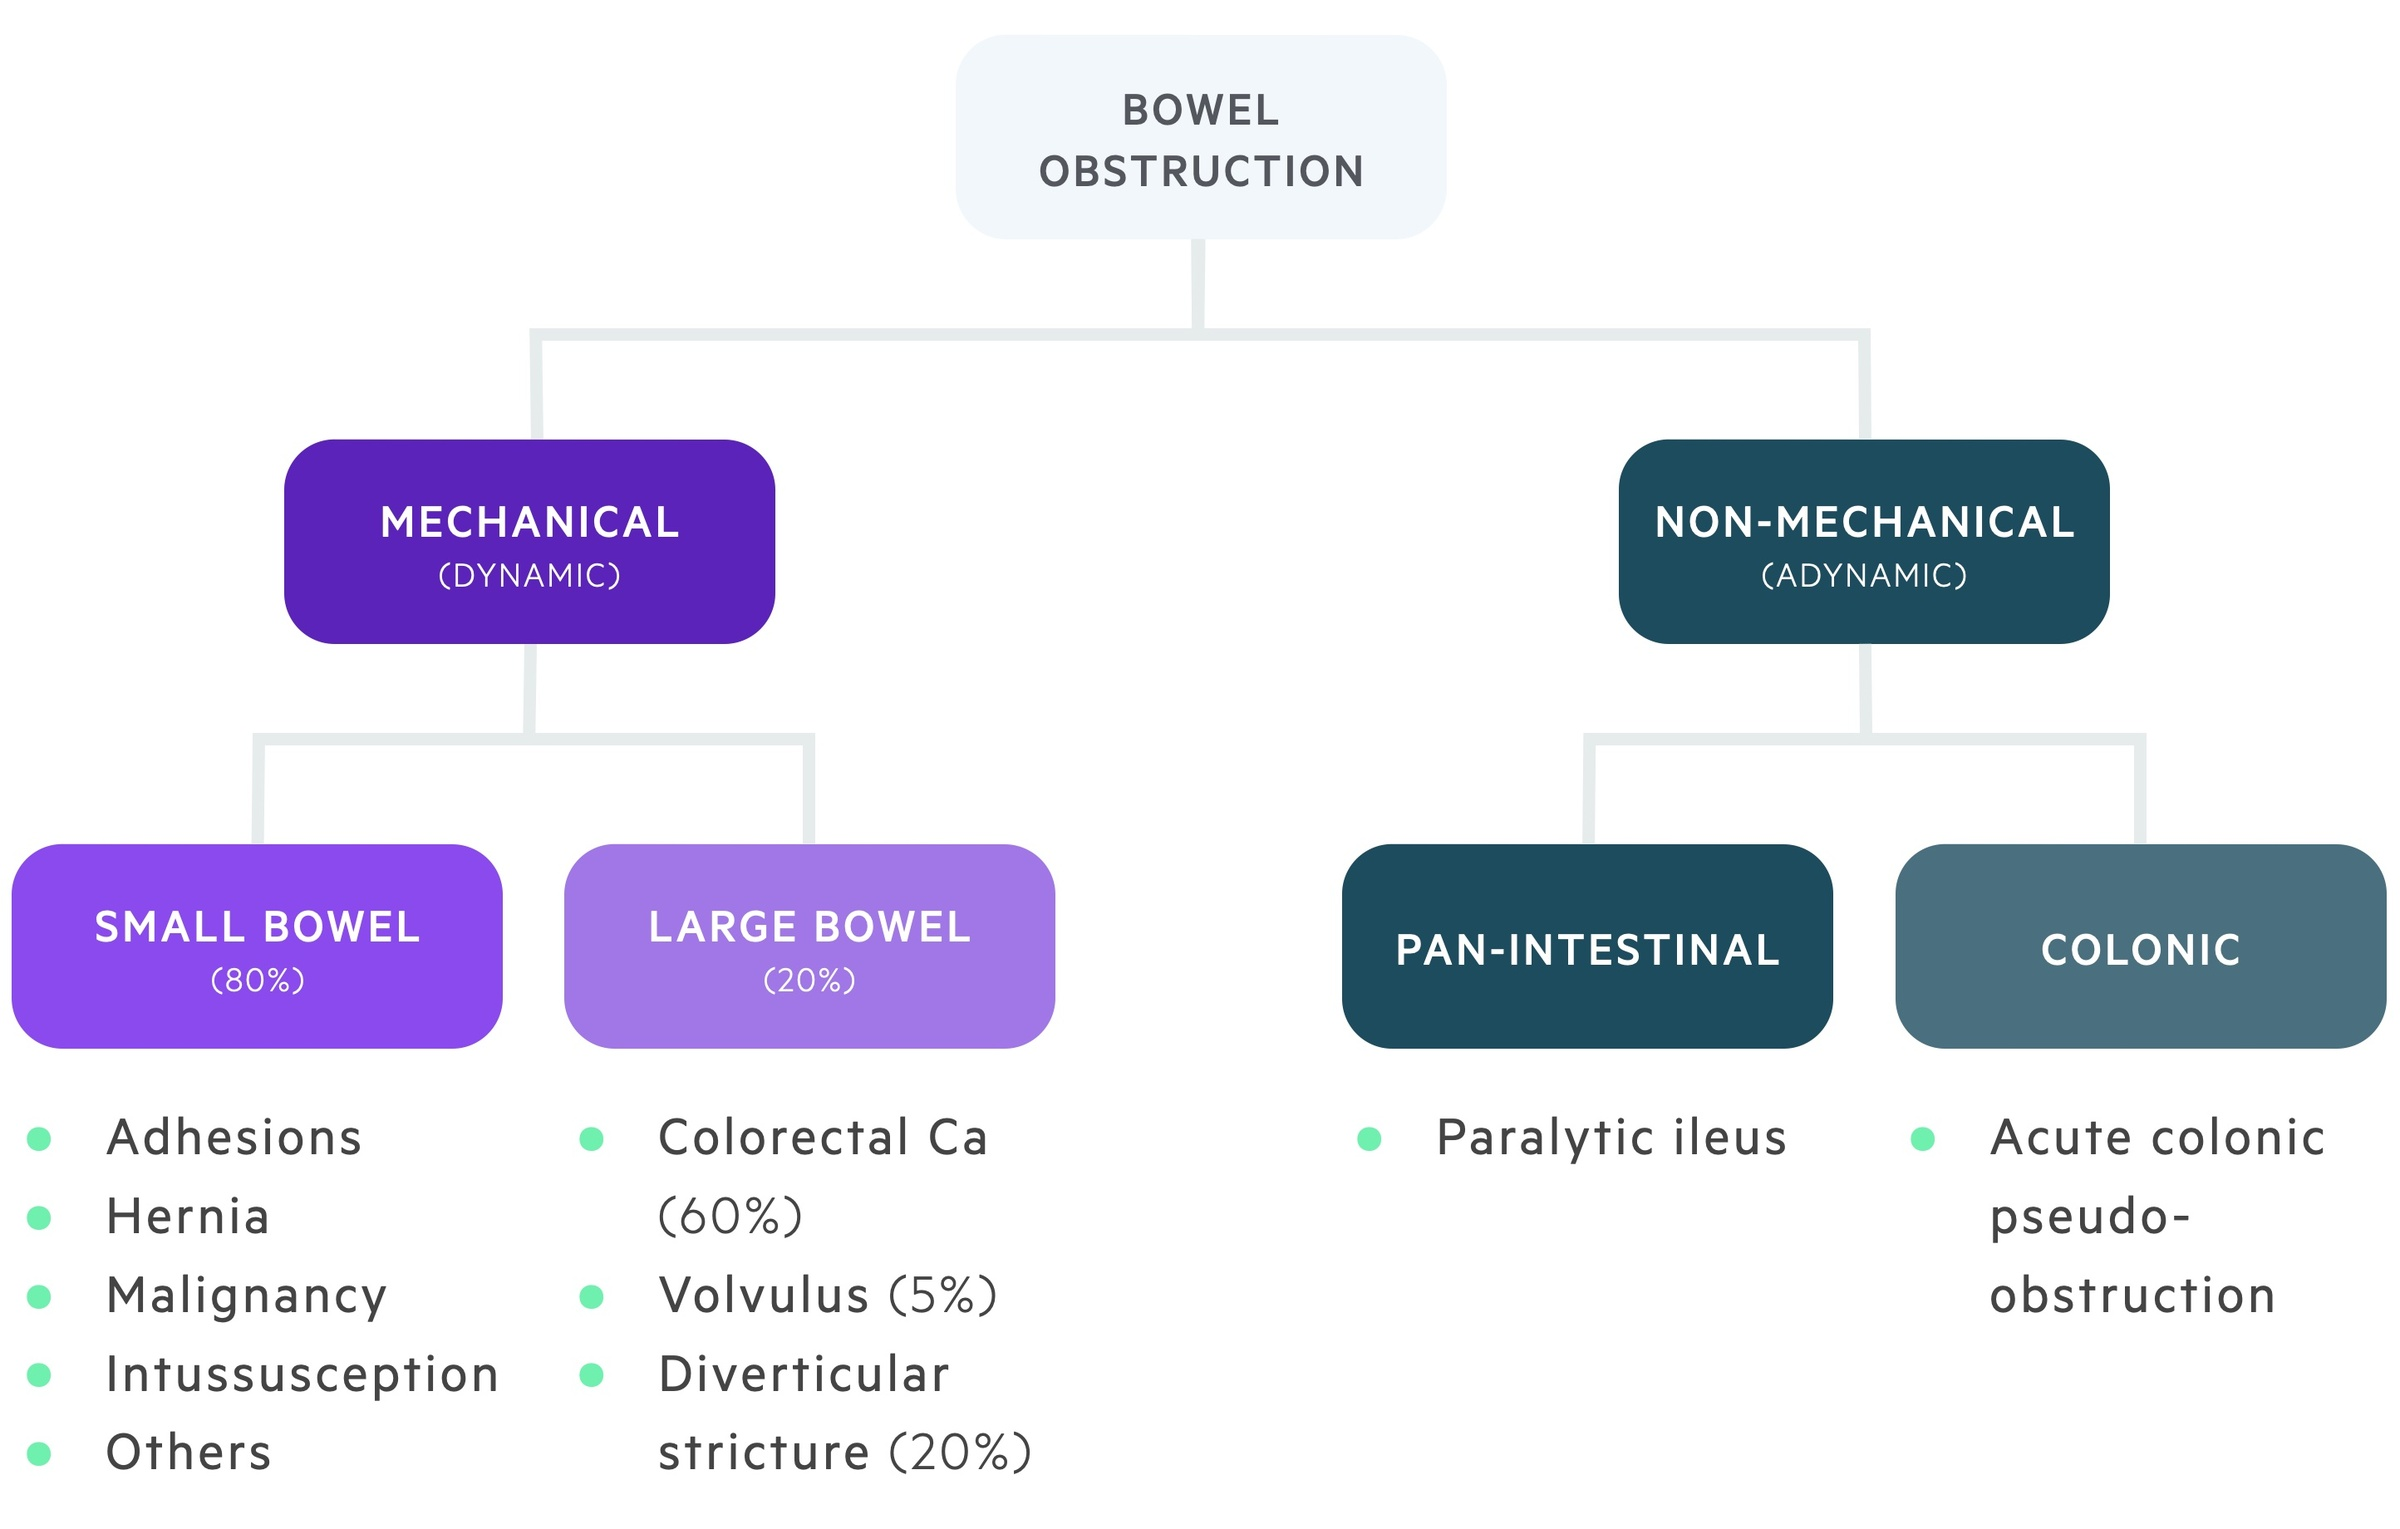 Aetiology of bowel obstruction